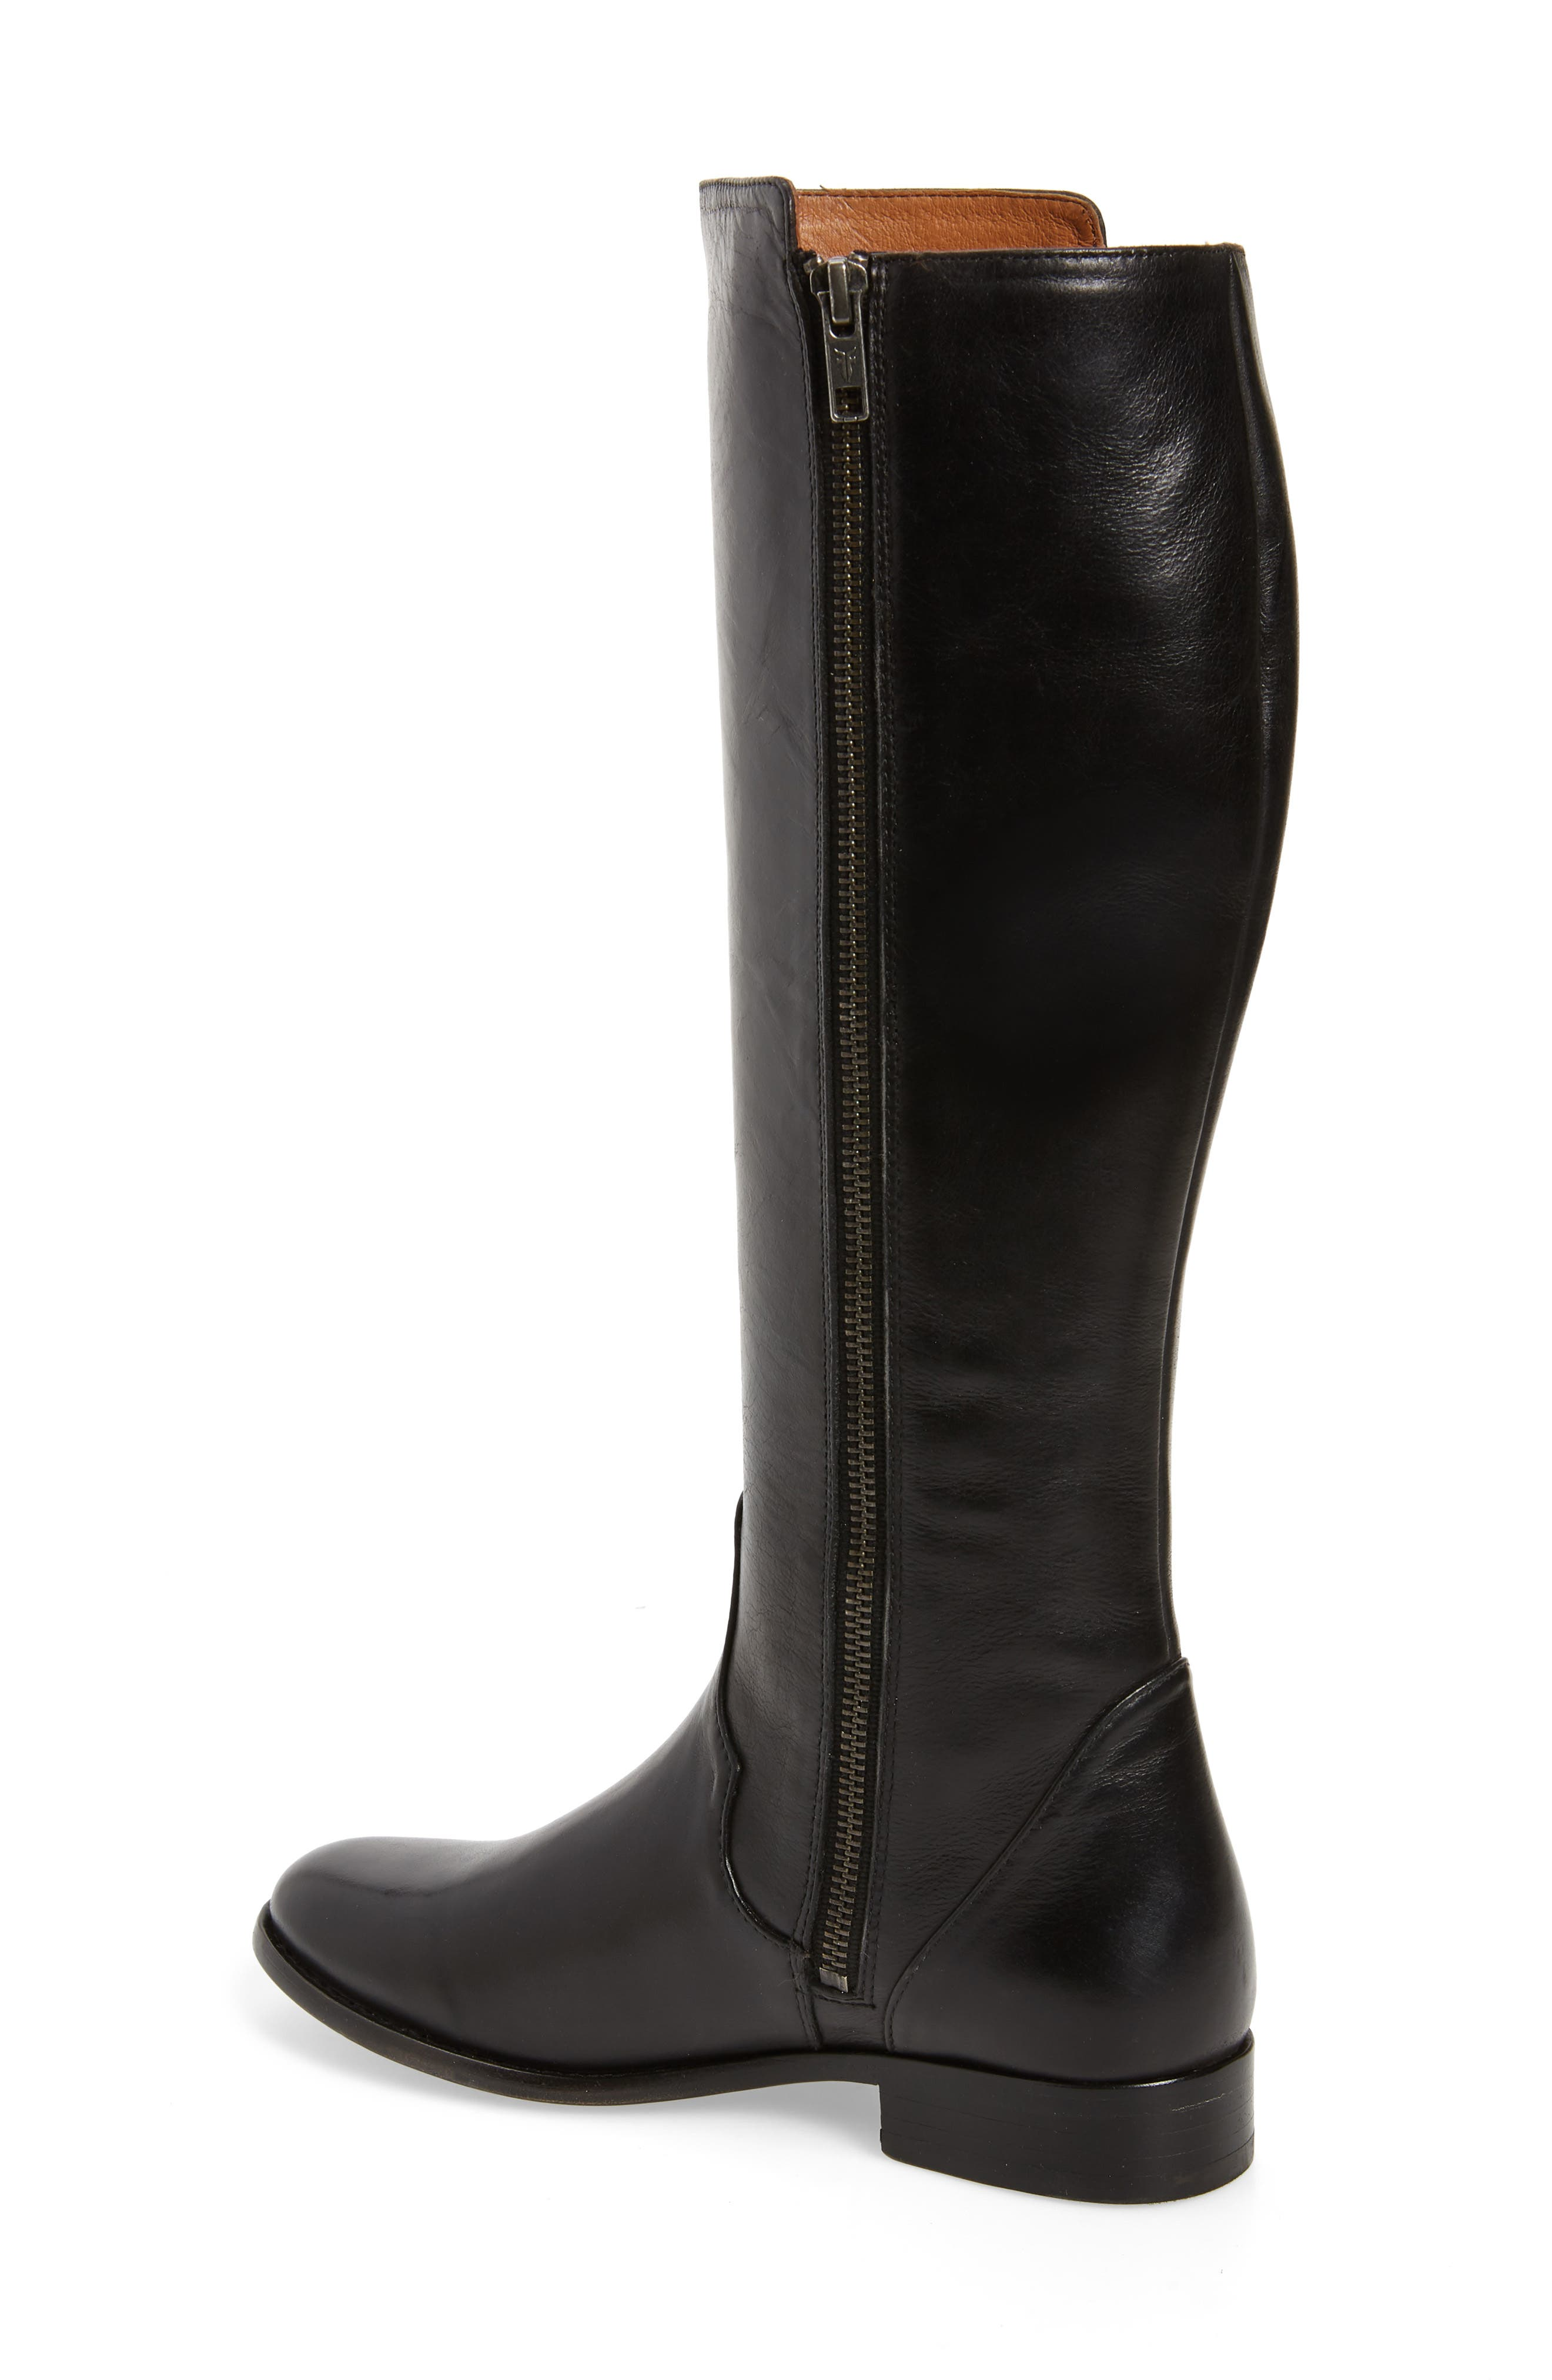 f1e77fa0dc660 Women's Frye Shoes | Nordstrom